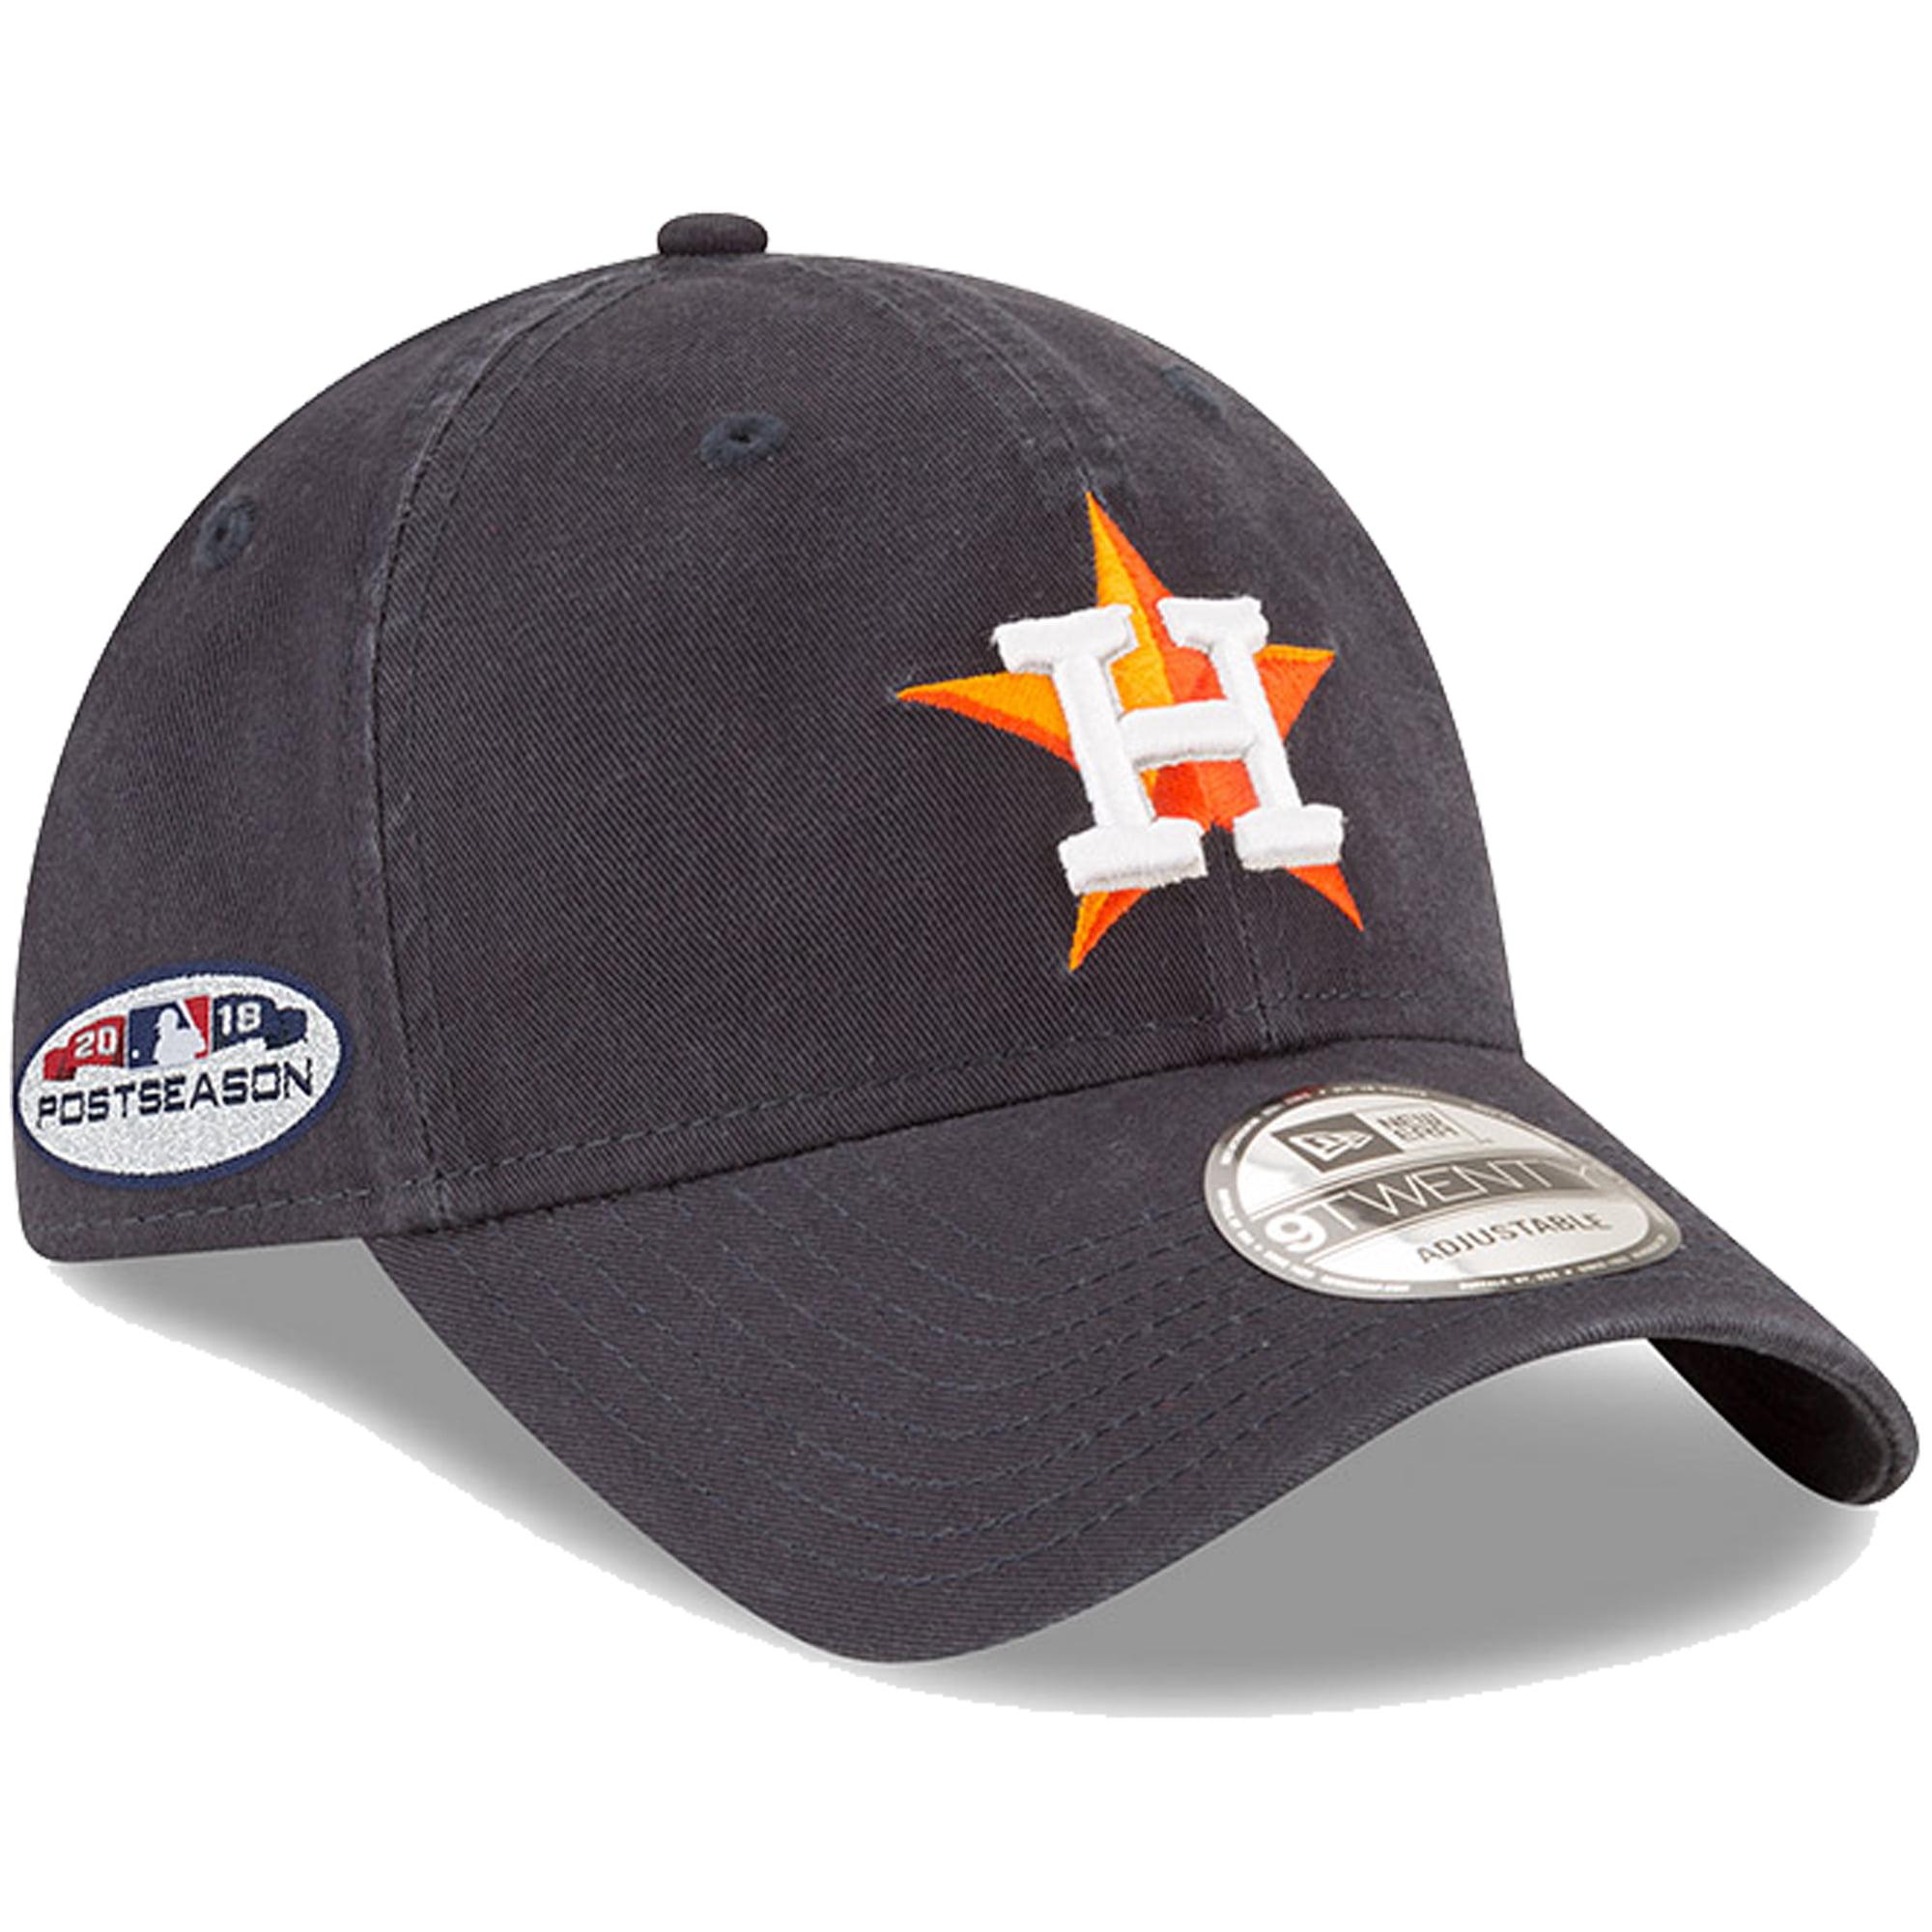 Houston Astros New Era 2018 Post Season Side Patch 9TWENTY Adjustable Hat - Navy - OSFA